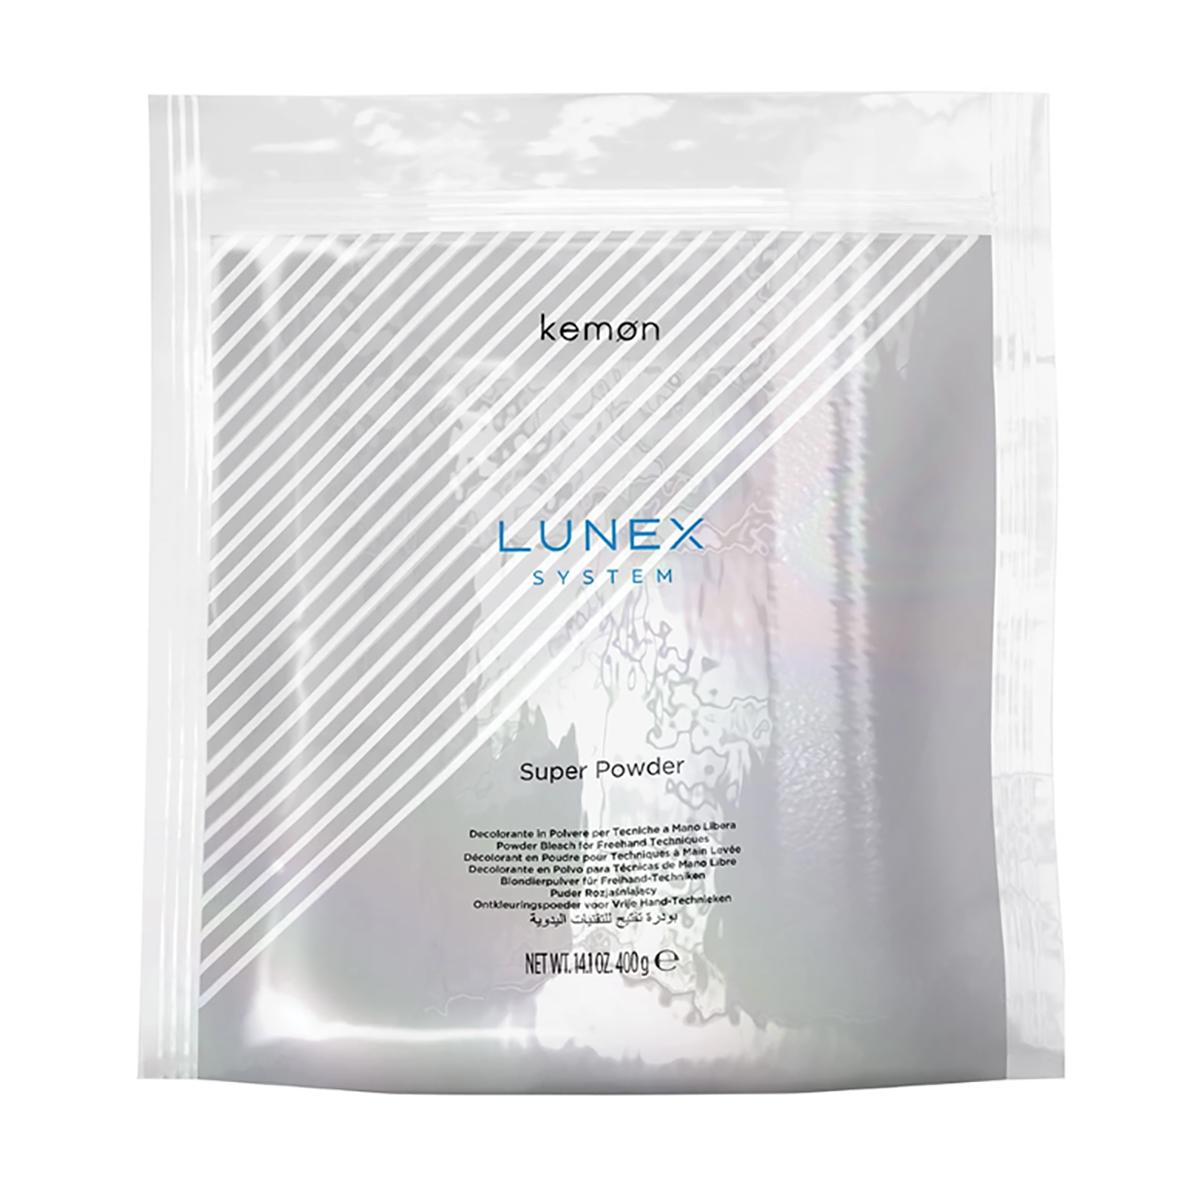 09 Polvere decolorante Kemon Lunex System da 400 gr